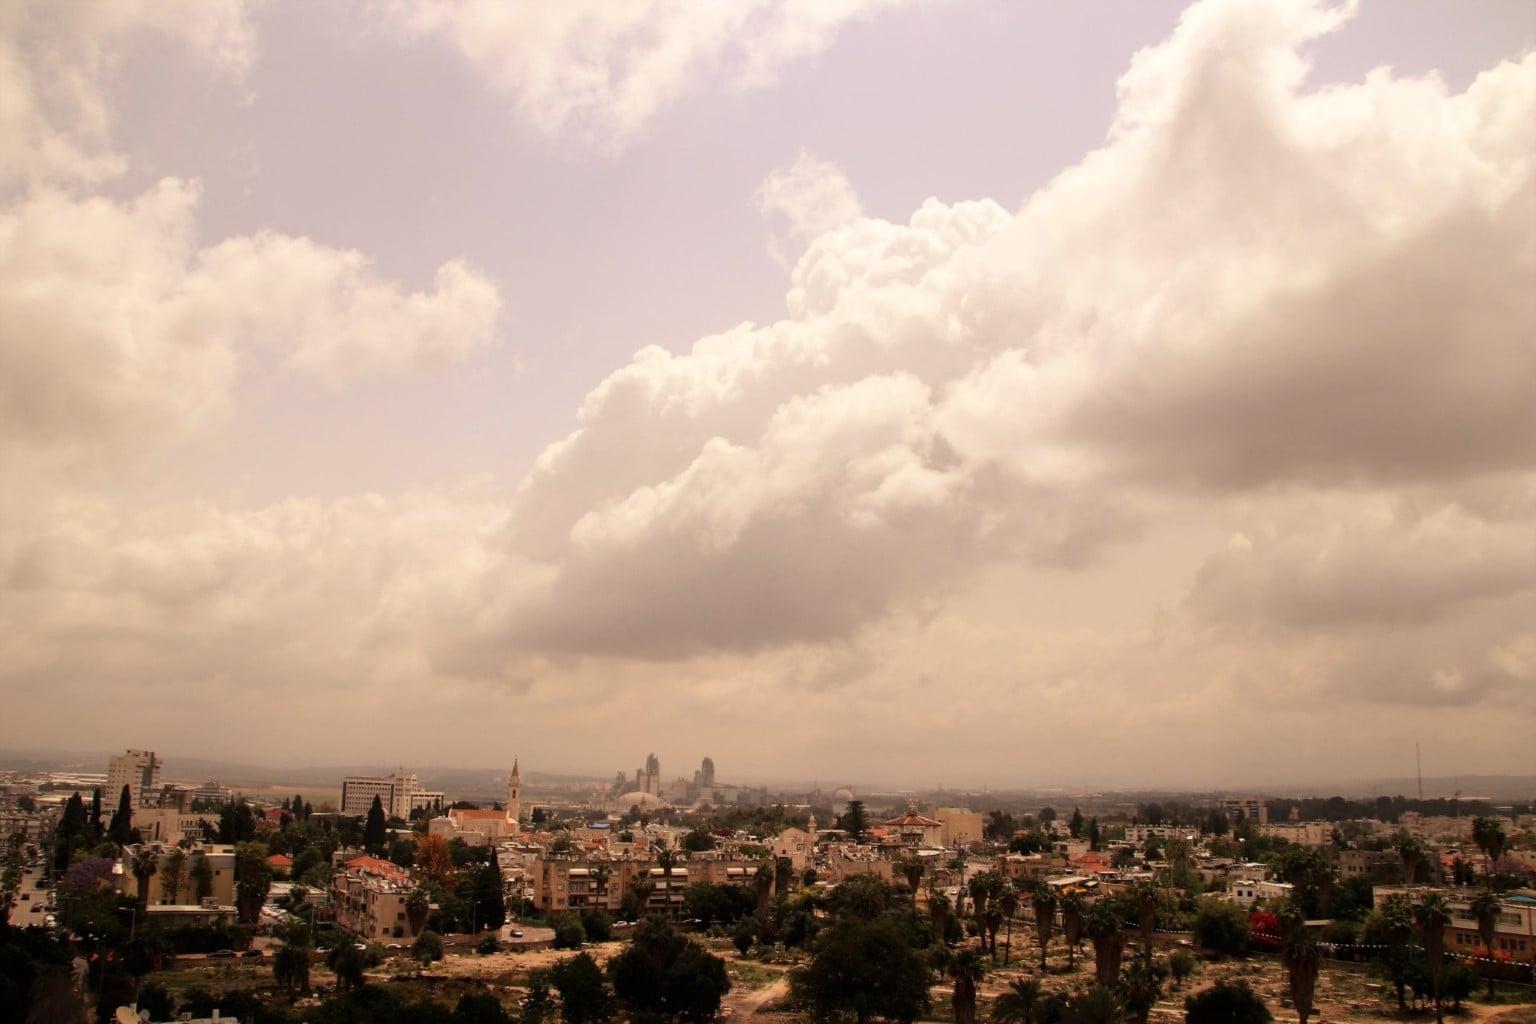 Ramla The White Tower view